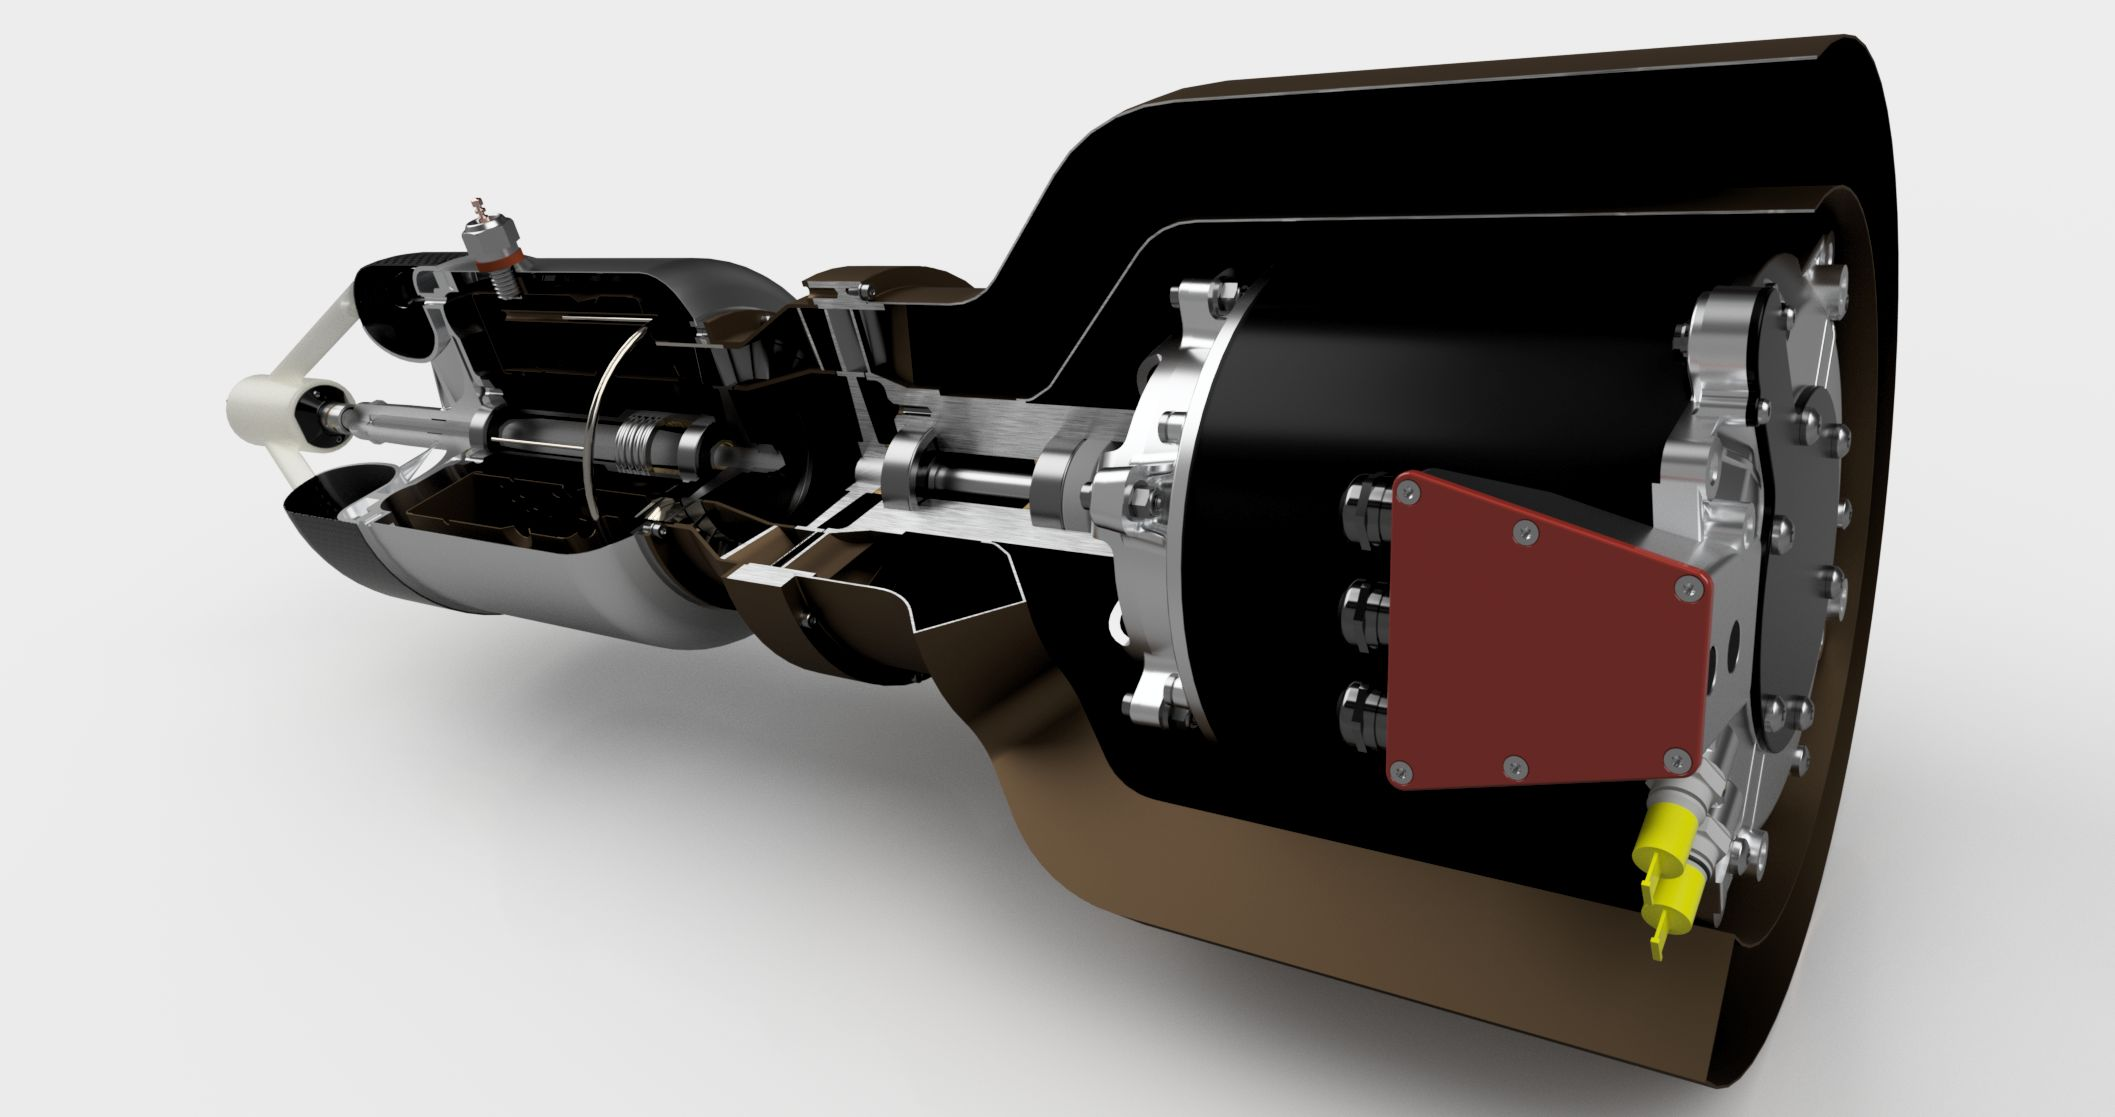 Fus-ray-trace-gas-turbine-generator-04-3500-3500